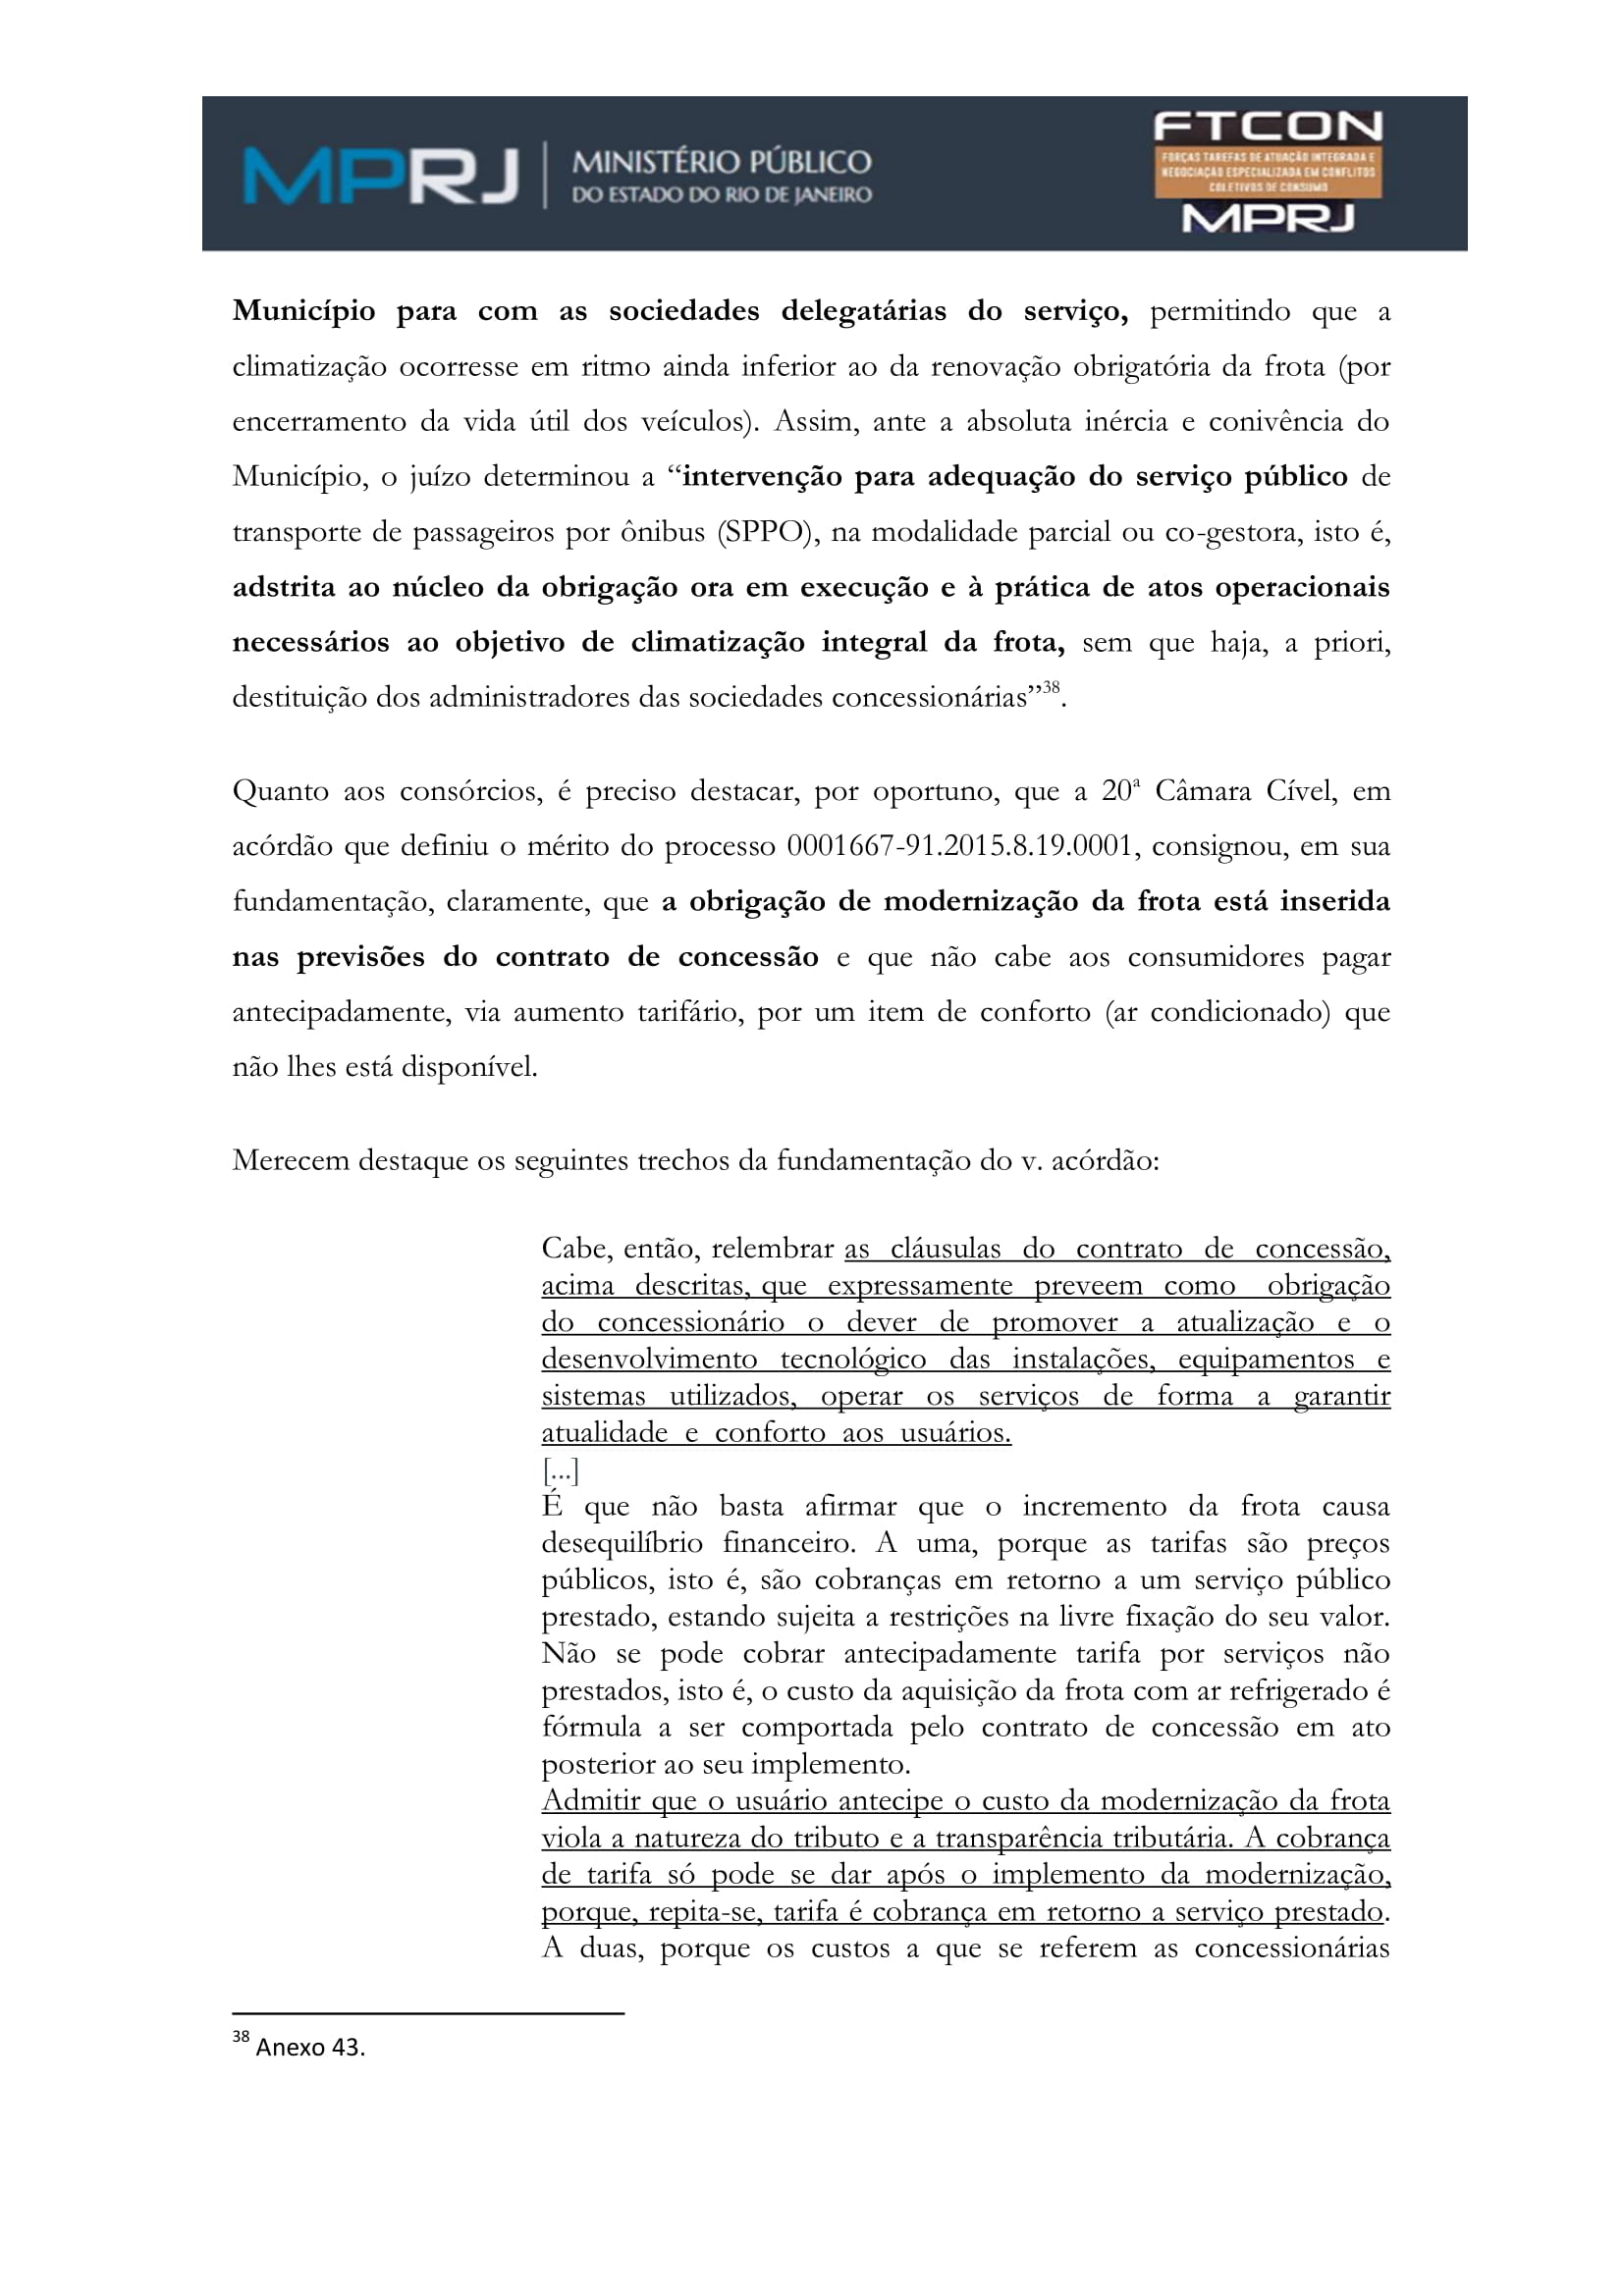 acp_caducidade_onibus_dr_rt-043